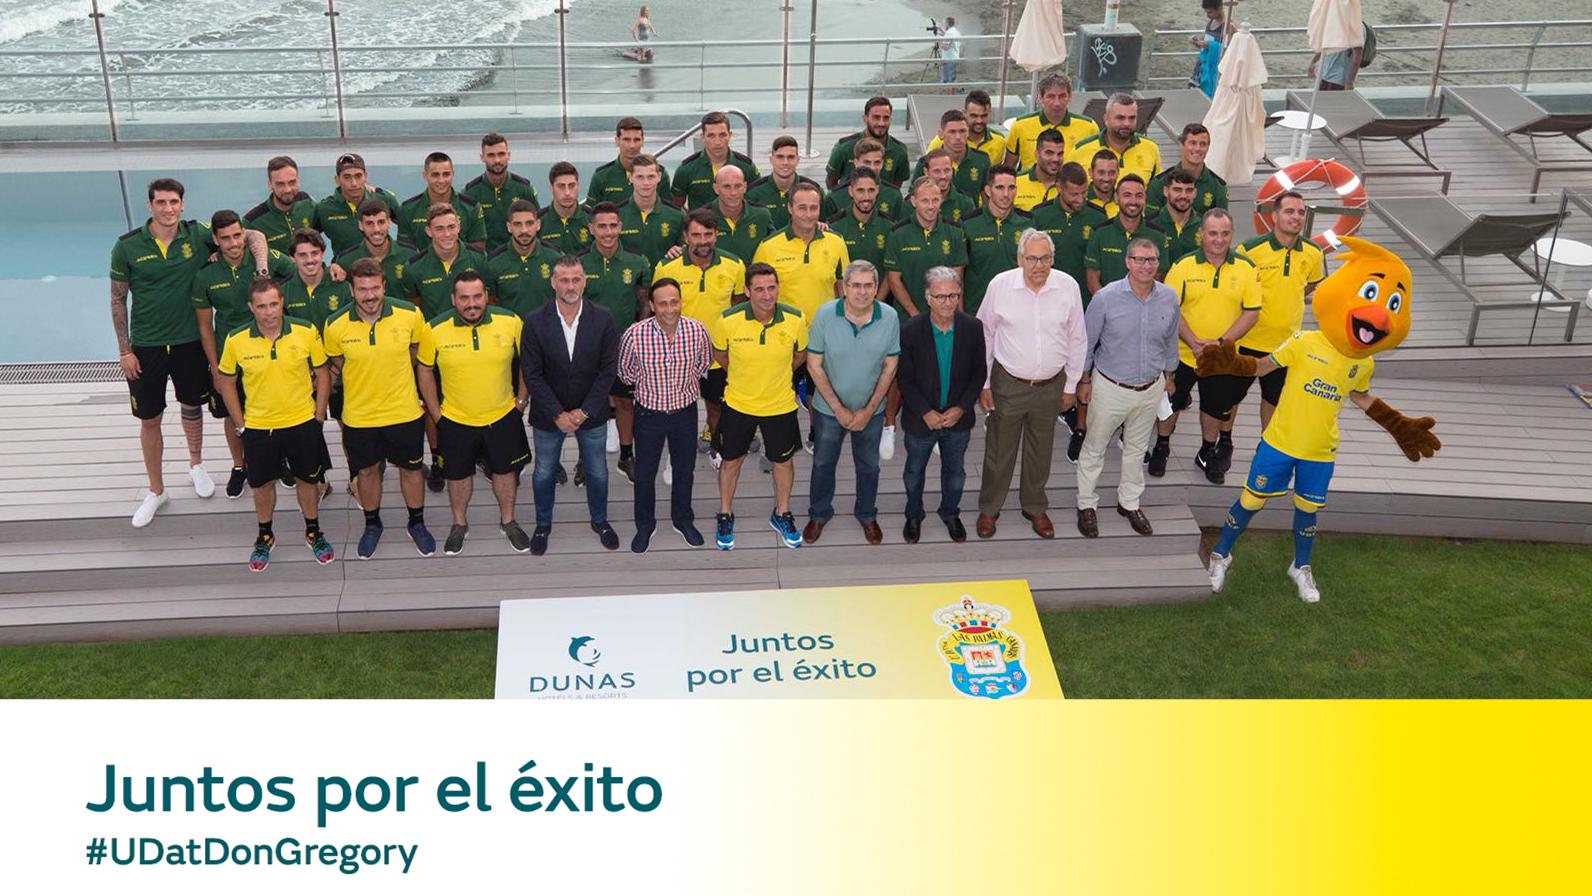 7ter Aufenthalt des Fußballvereins Unión Deportiva Las Palmas im Don Gregory